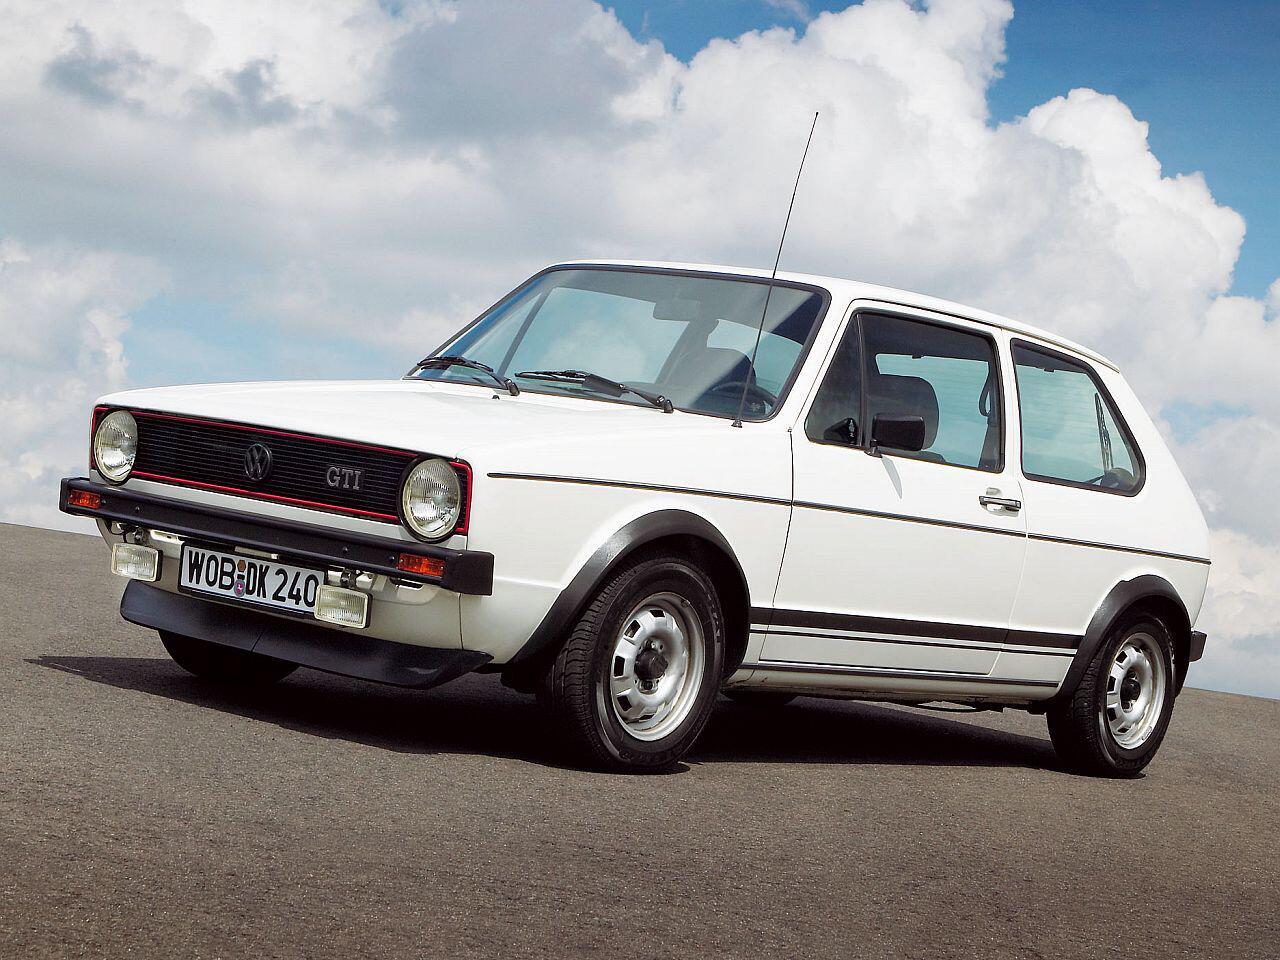 Bild zu VW Golf 1 GTI